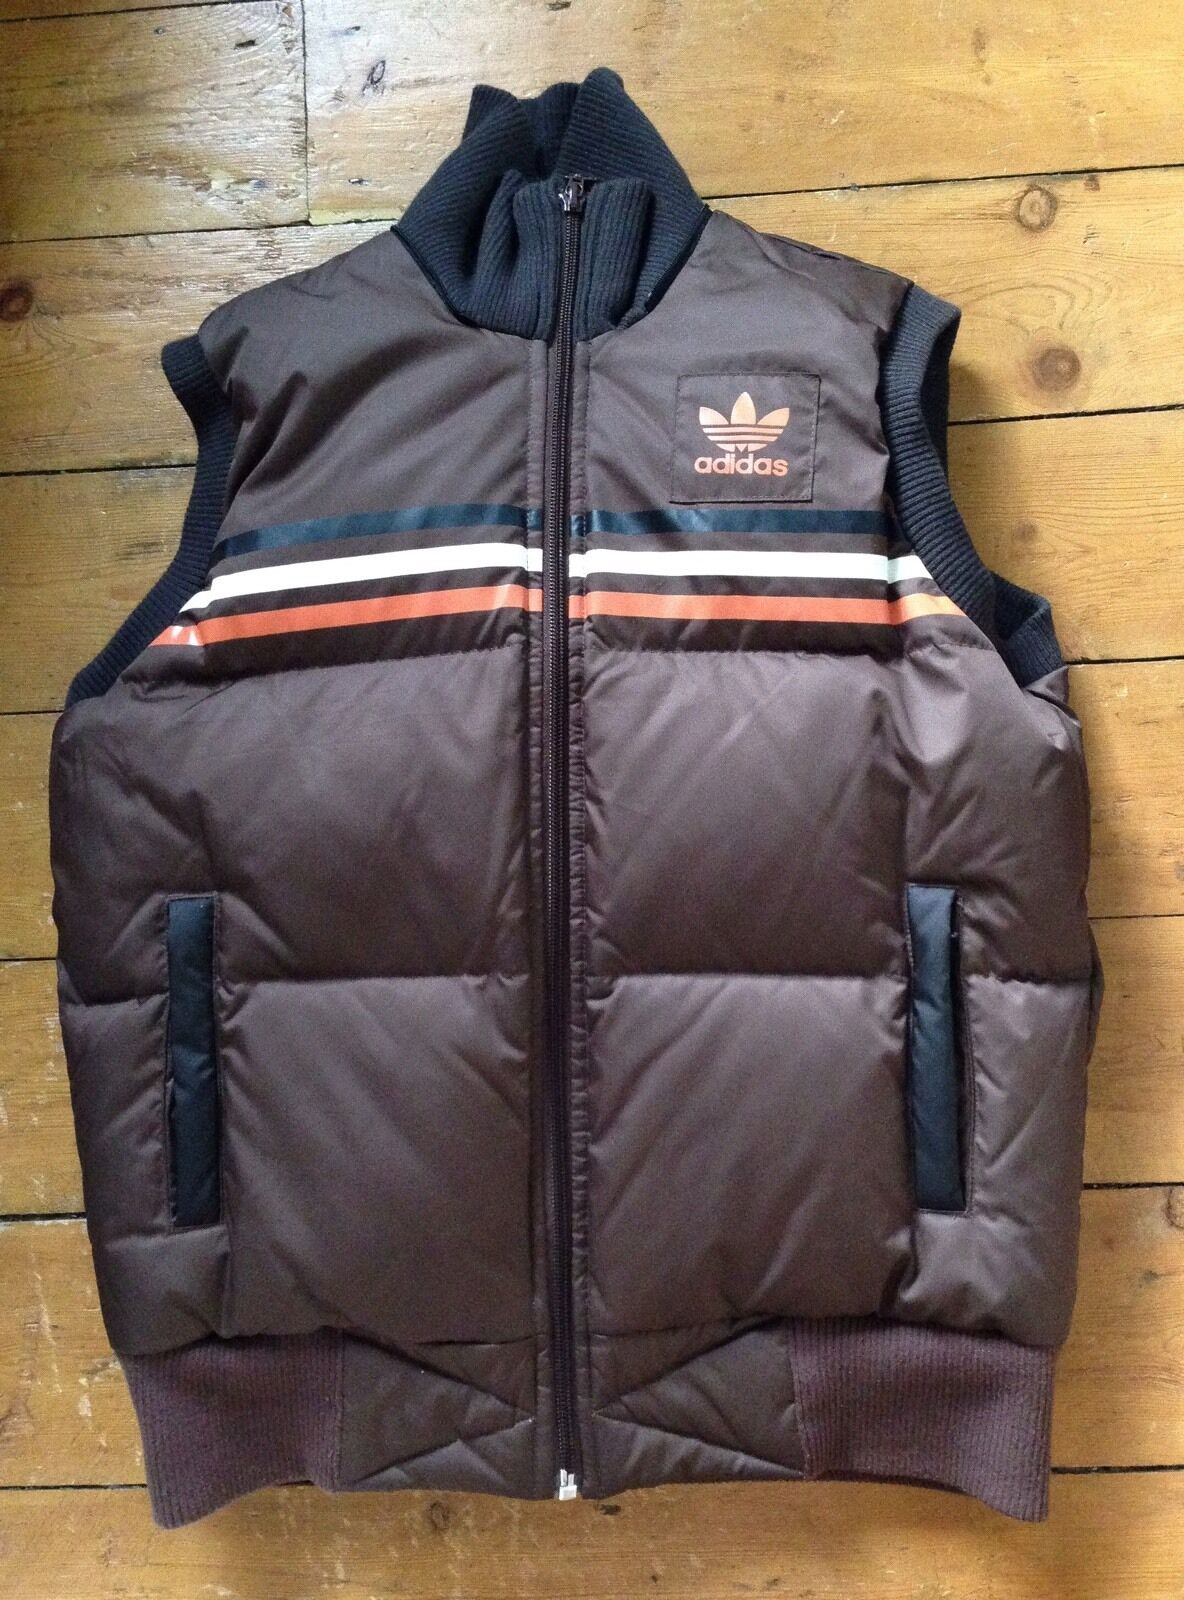 Adidas Original ΓυναικΡία ΞšΞ±Ο†Ξ Gilet Body warmer ΞœΞΞ³Ξ΅ΞΈΞΏΟ' UK 12